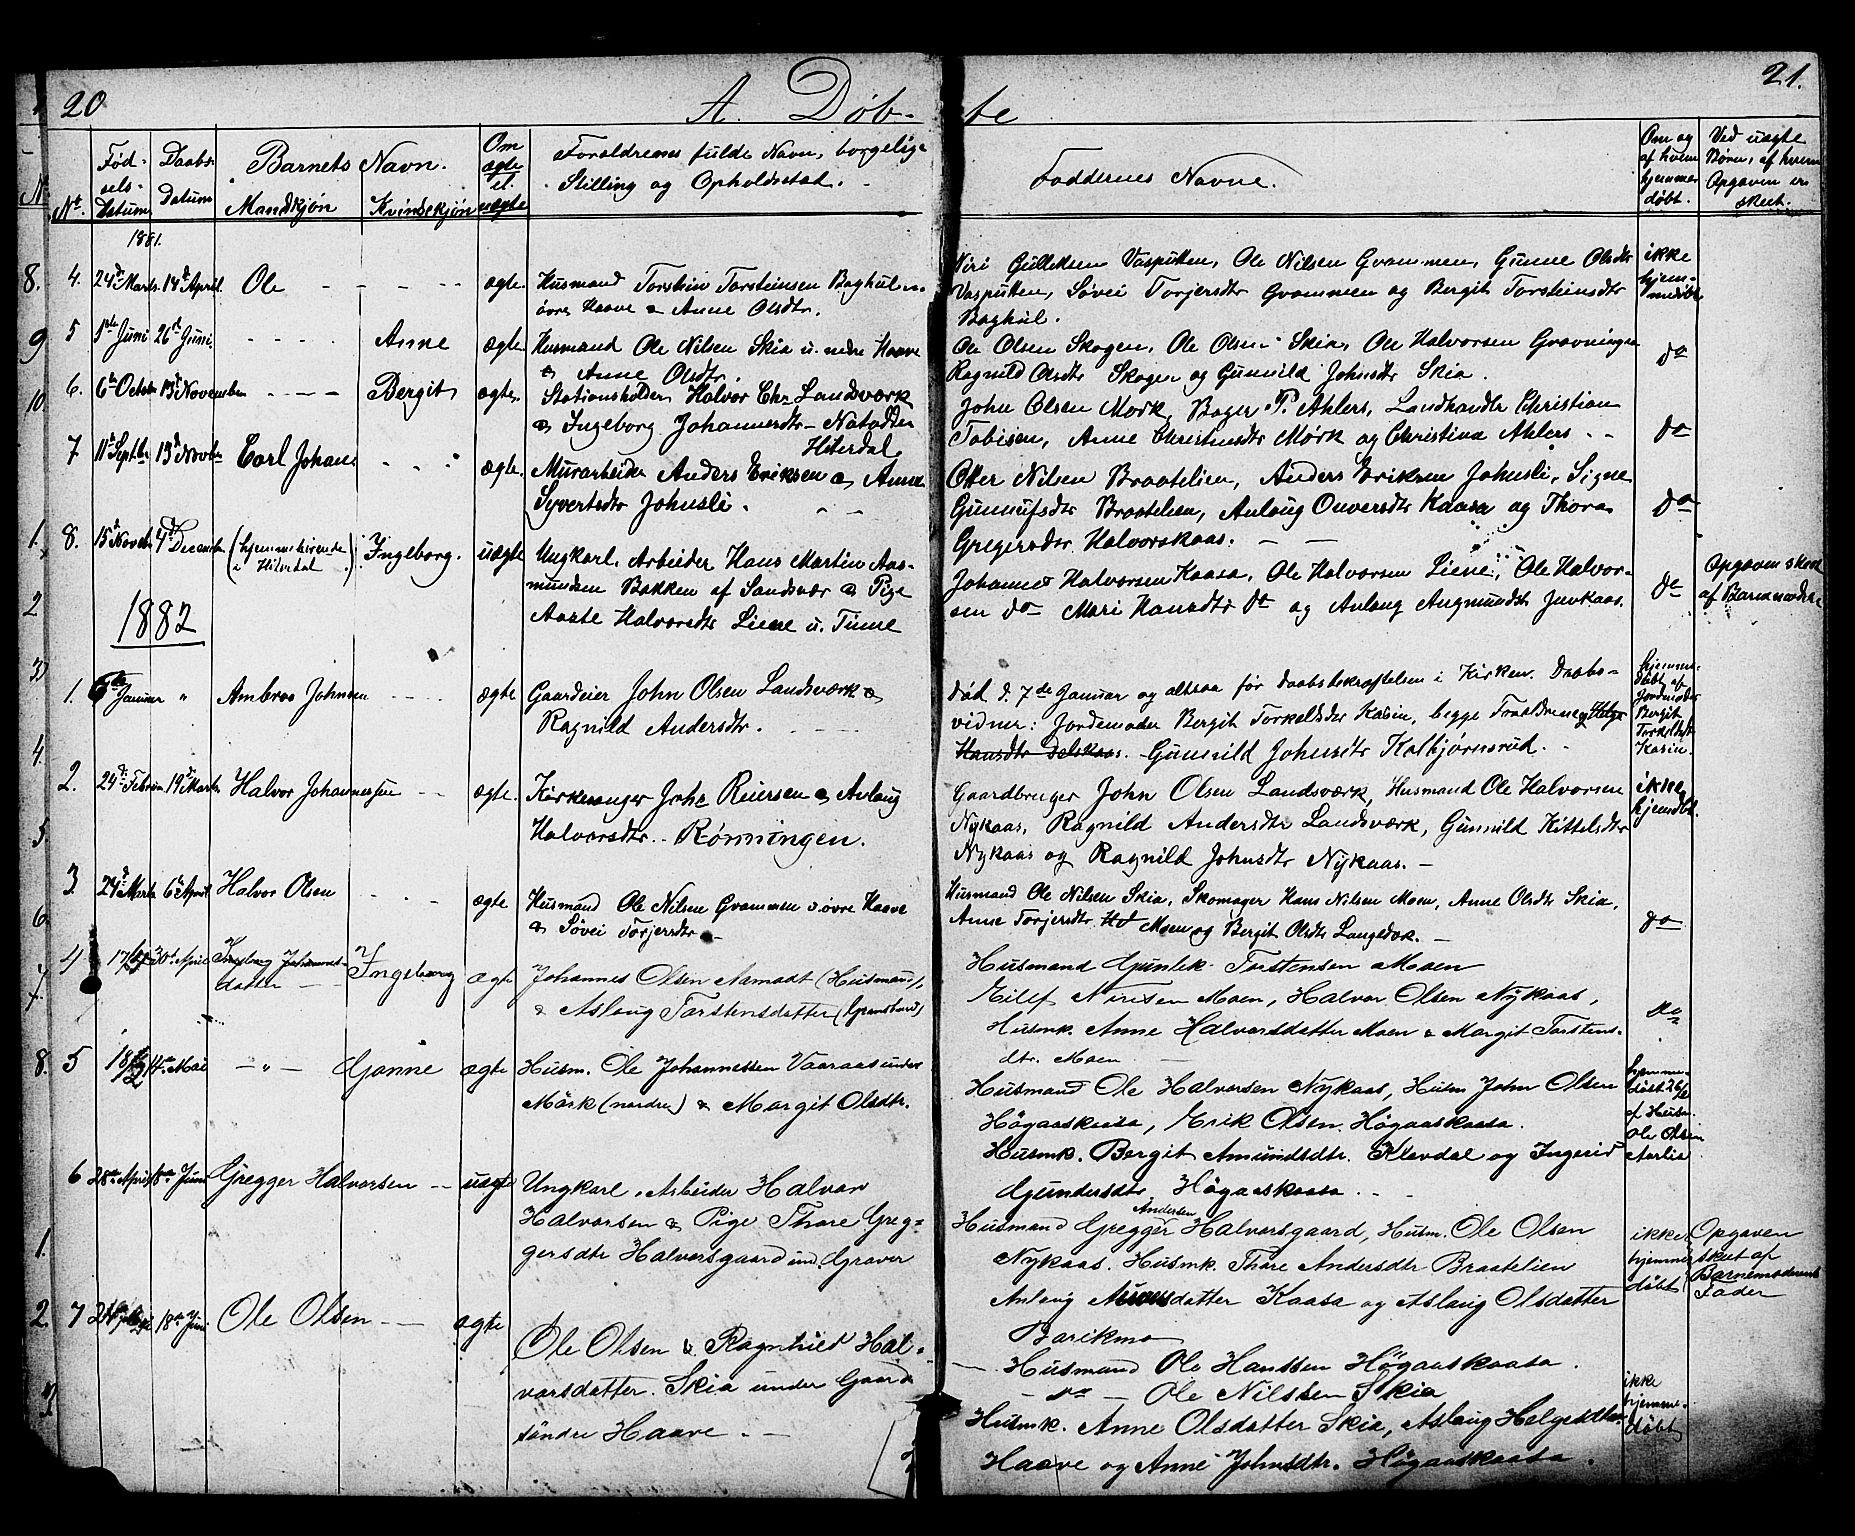 SAKO, Heddal kirkebøker, G/Gb/L0001: Klokkerbok nr. II 1, 1866-1887, s. 20-21